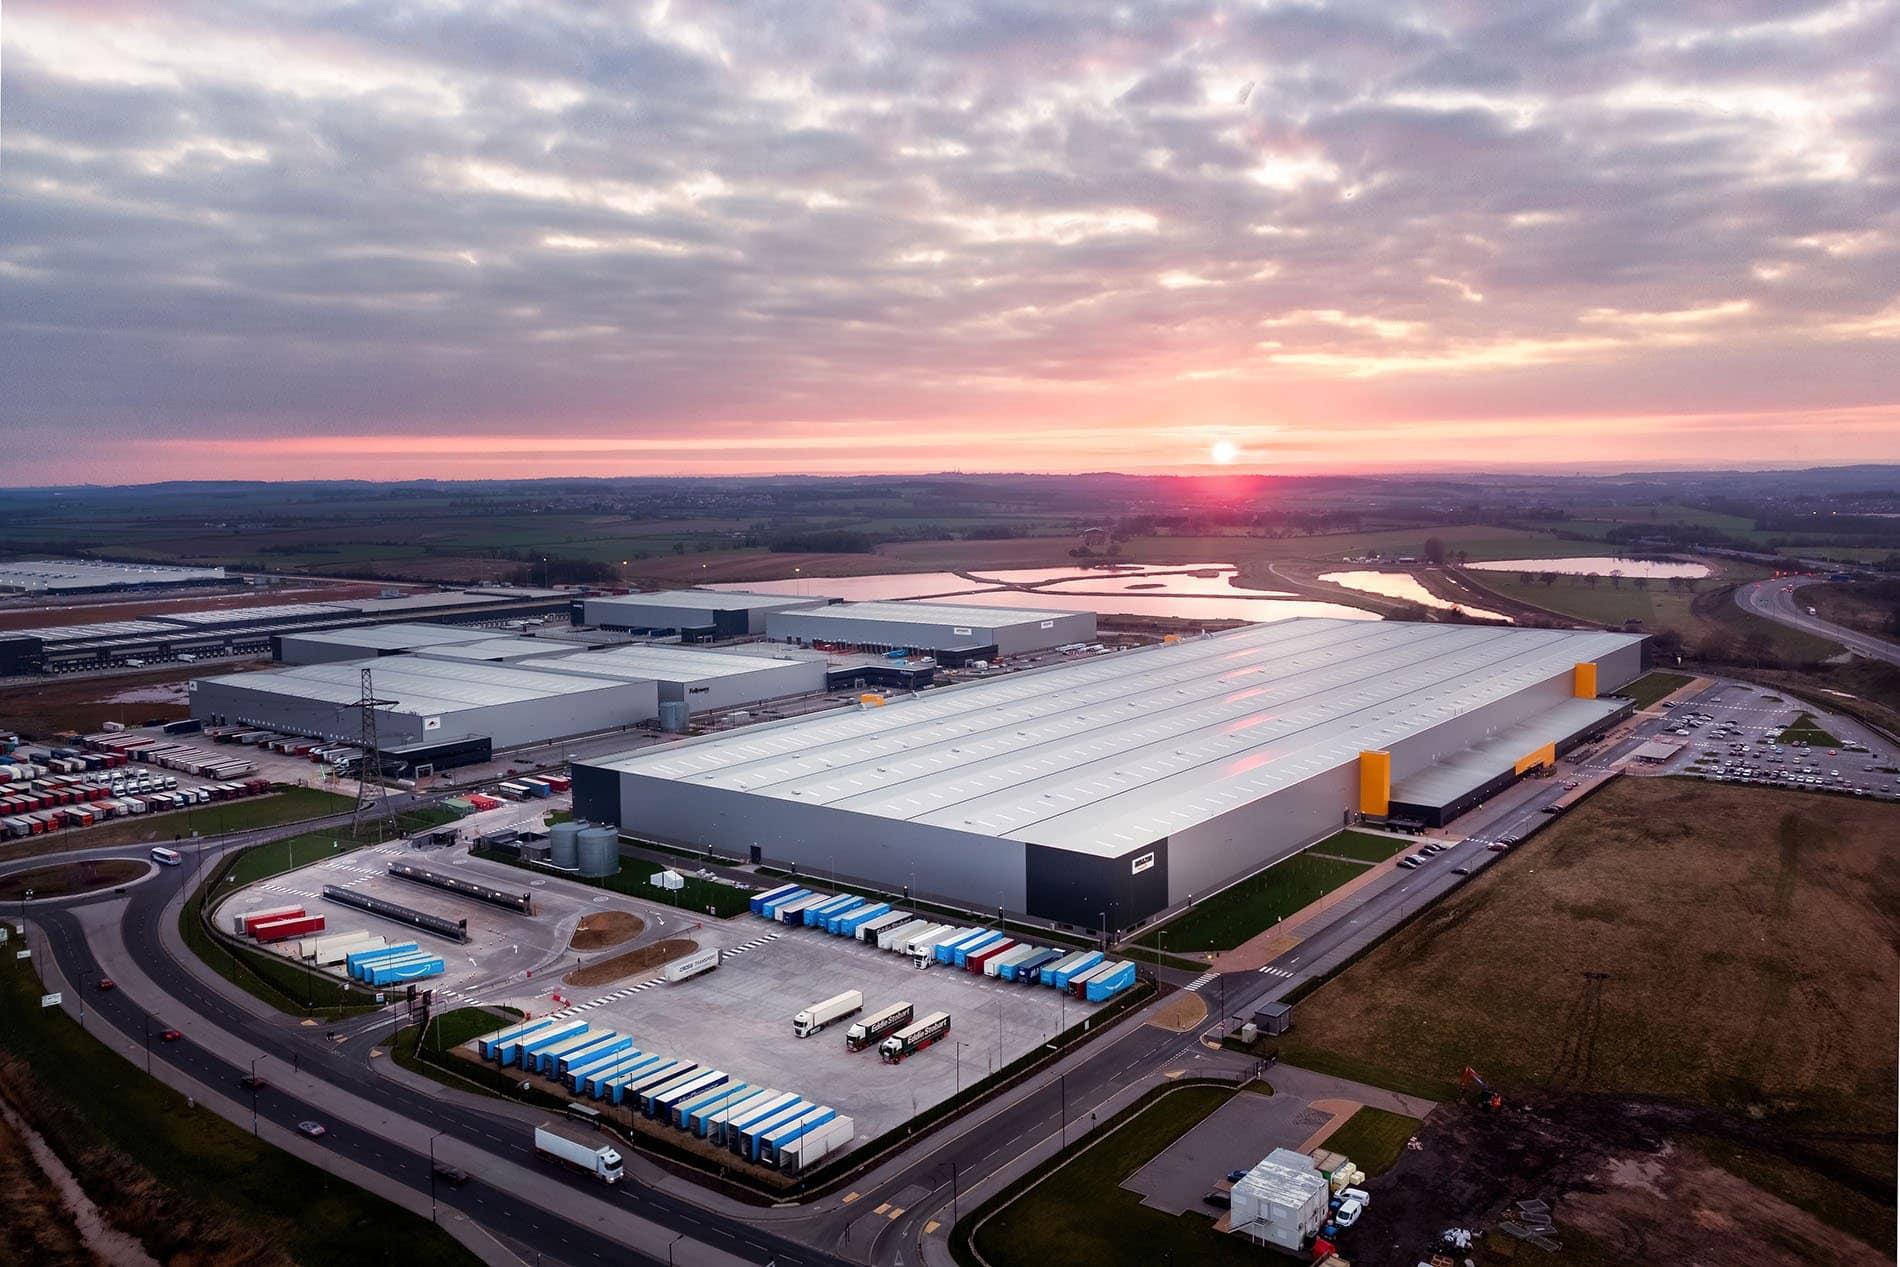 drone photo of amazon warehouse